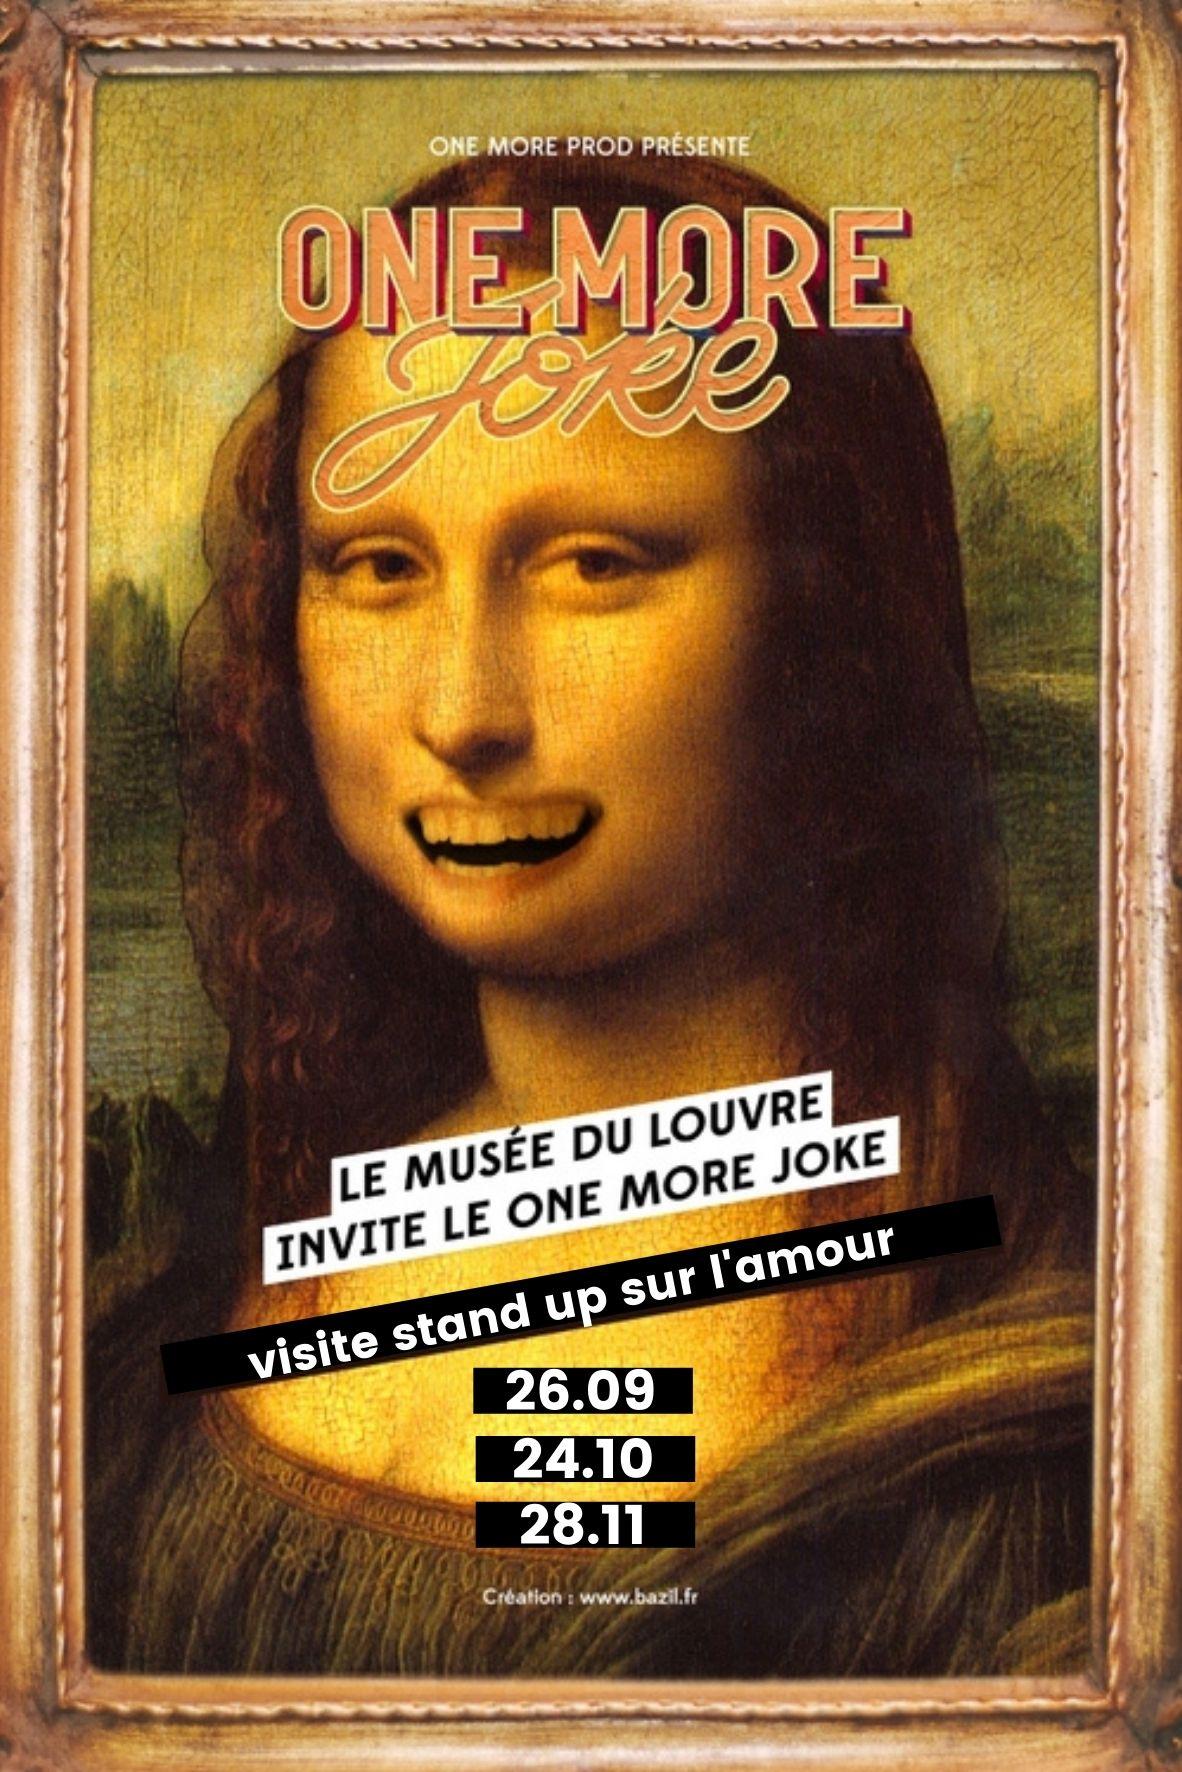 One More Joke X Le Louvre | Visite stand-up sur l'amour